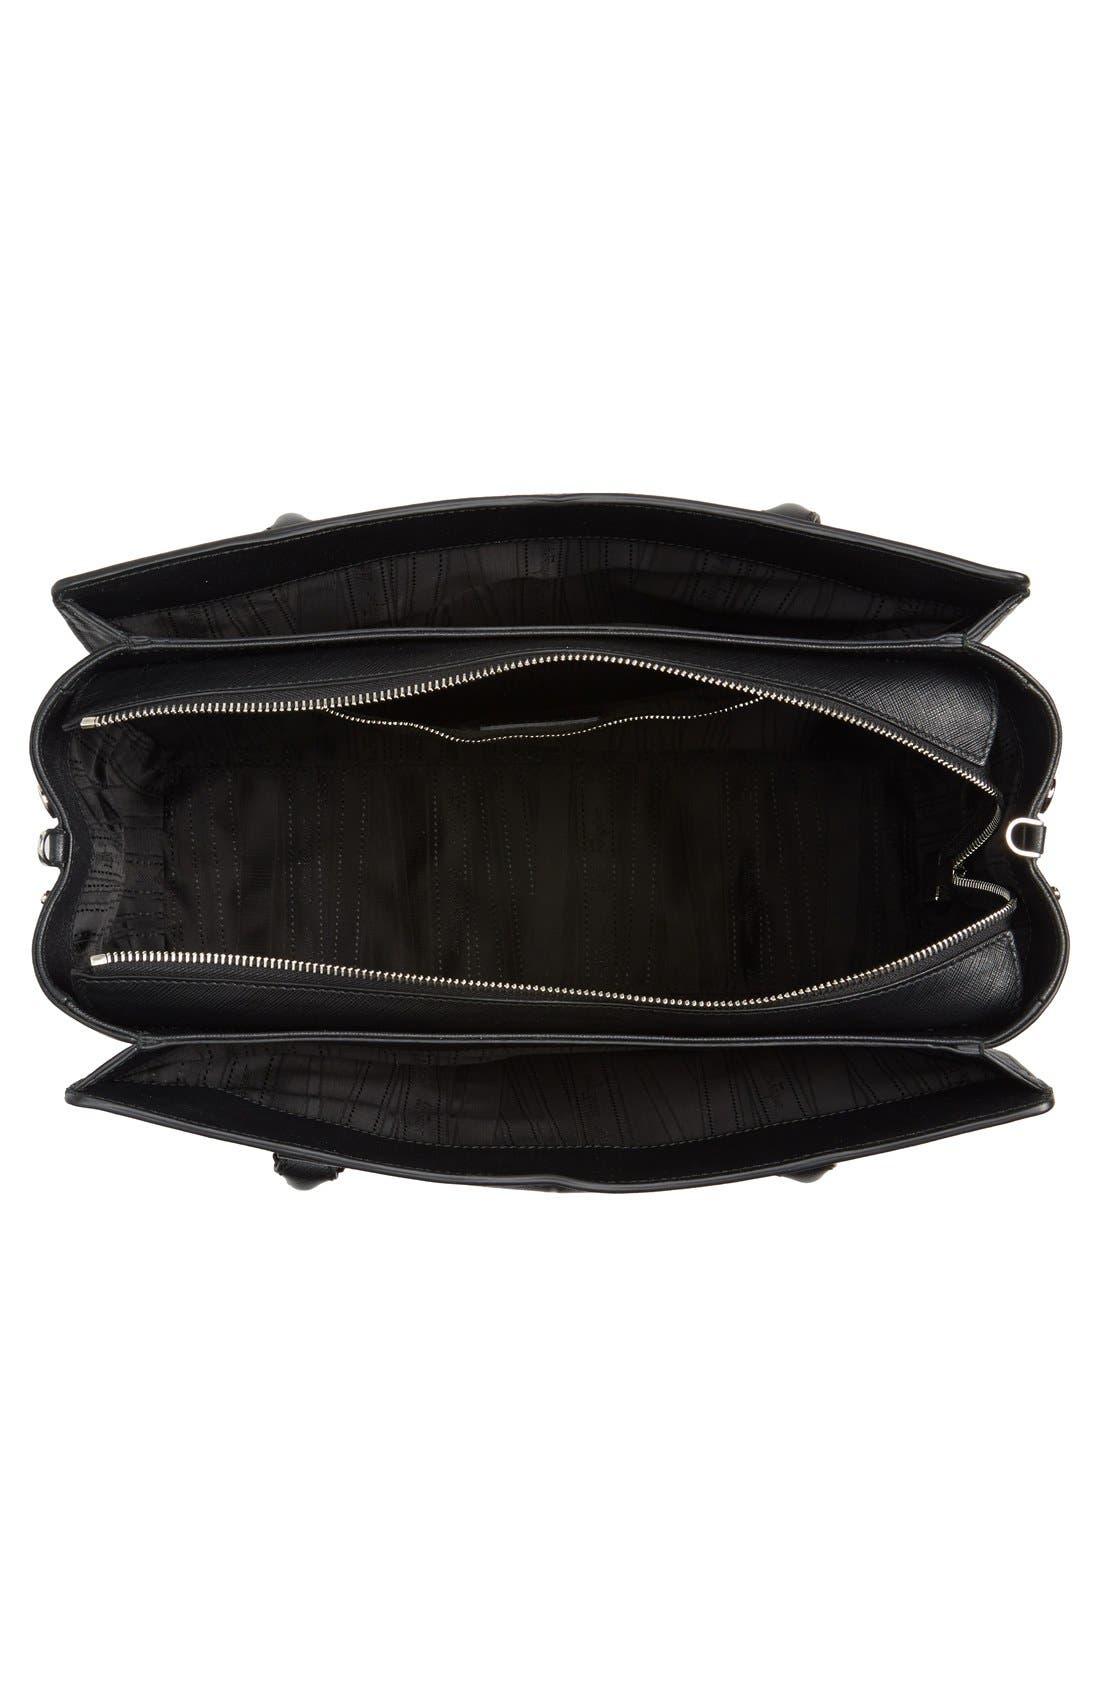 Alternate Image 4  - Salvatore Ferragamo Medium Saffiano Leather Tote